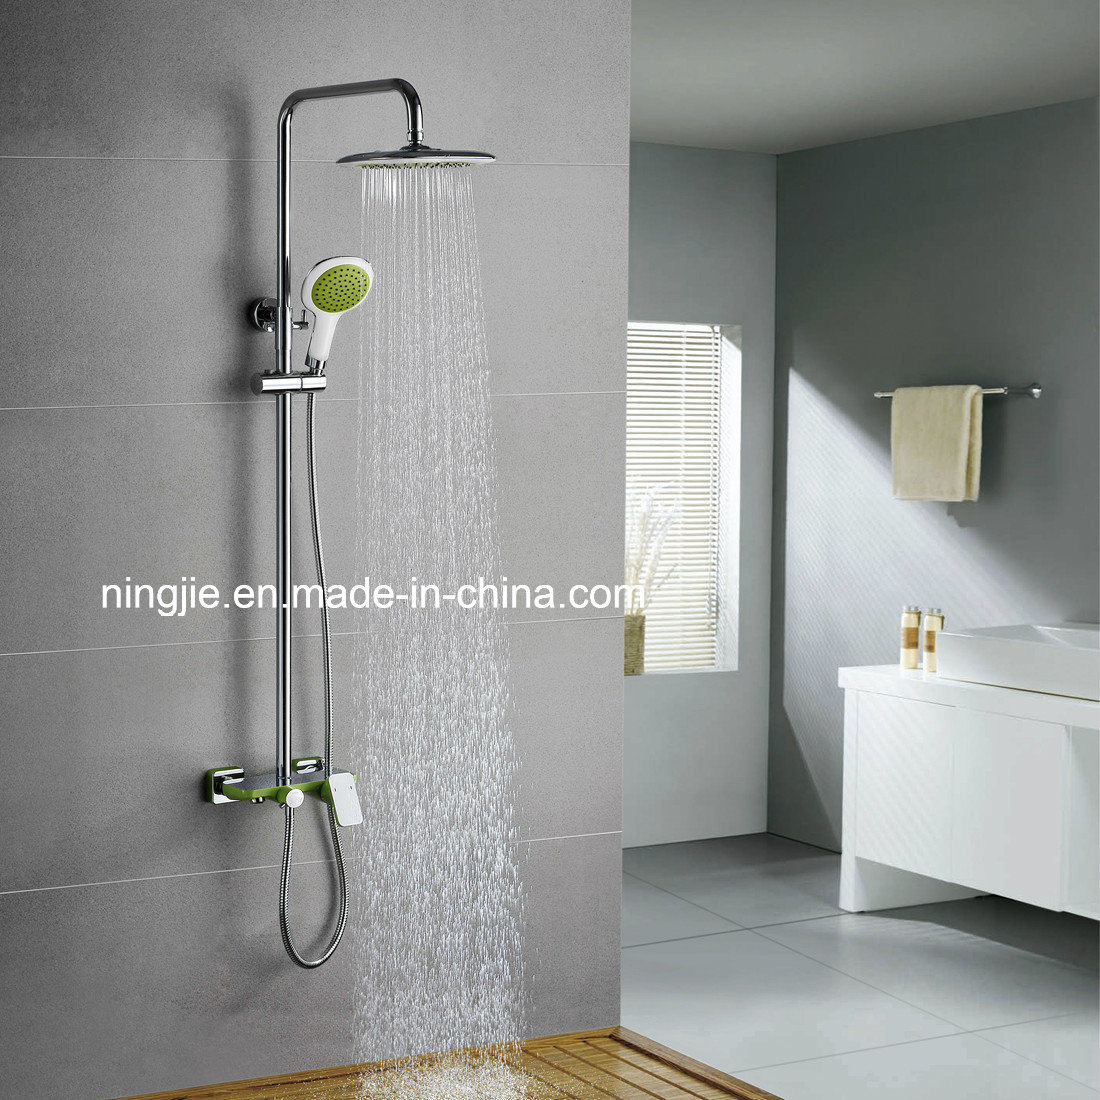 China Family Bathroom Wall-Mounted Raining Shower Mixed (13066YC ...